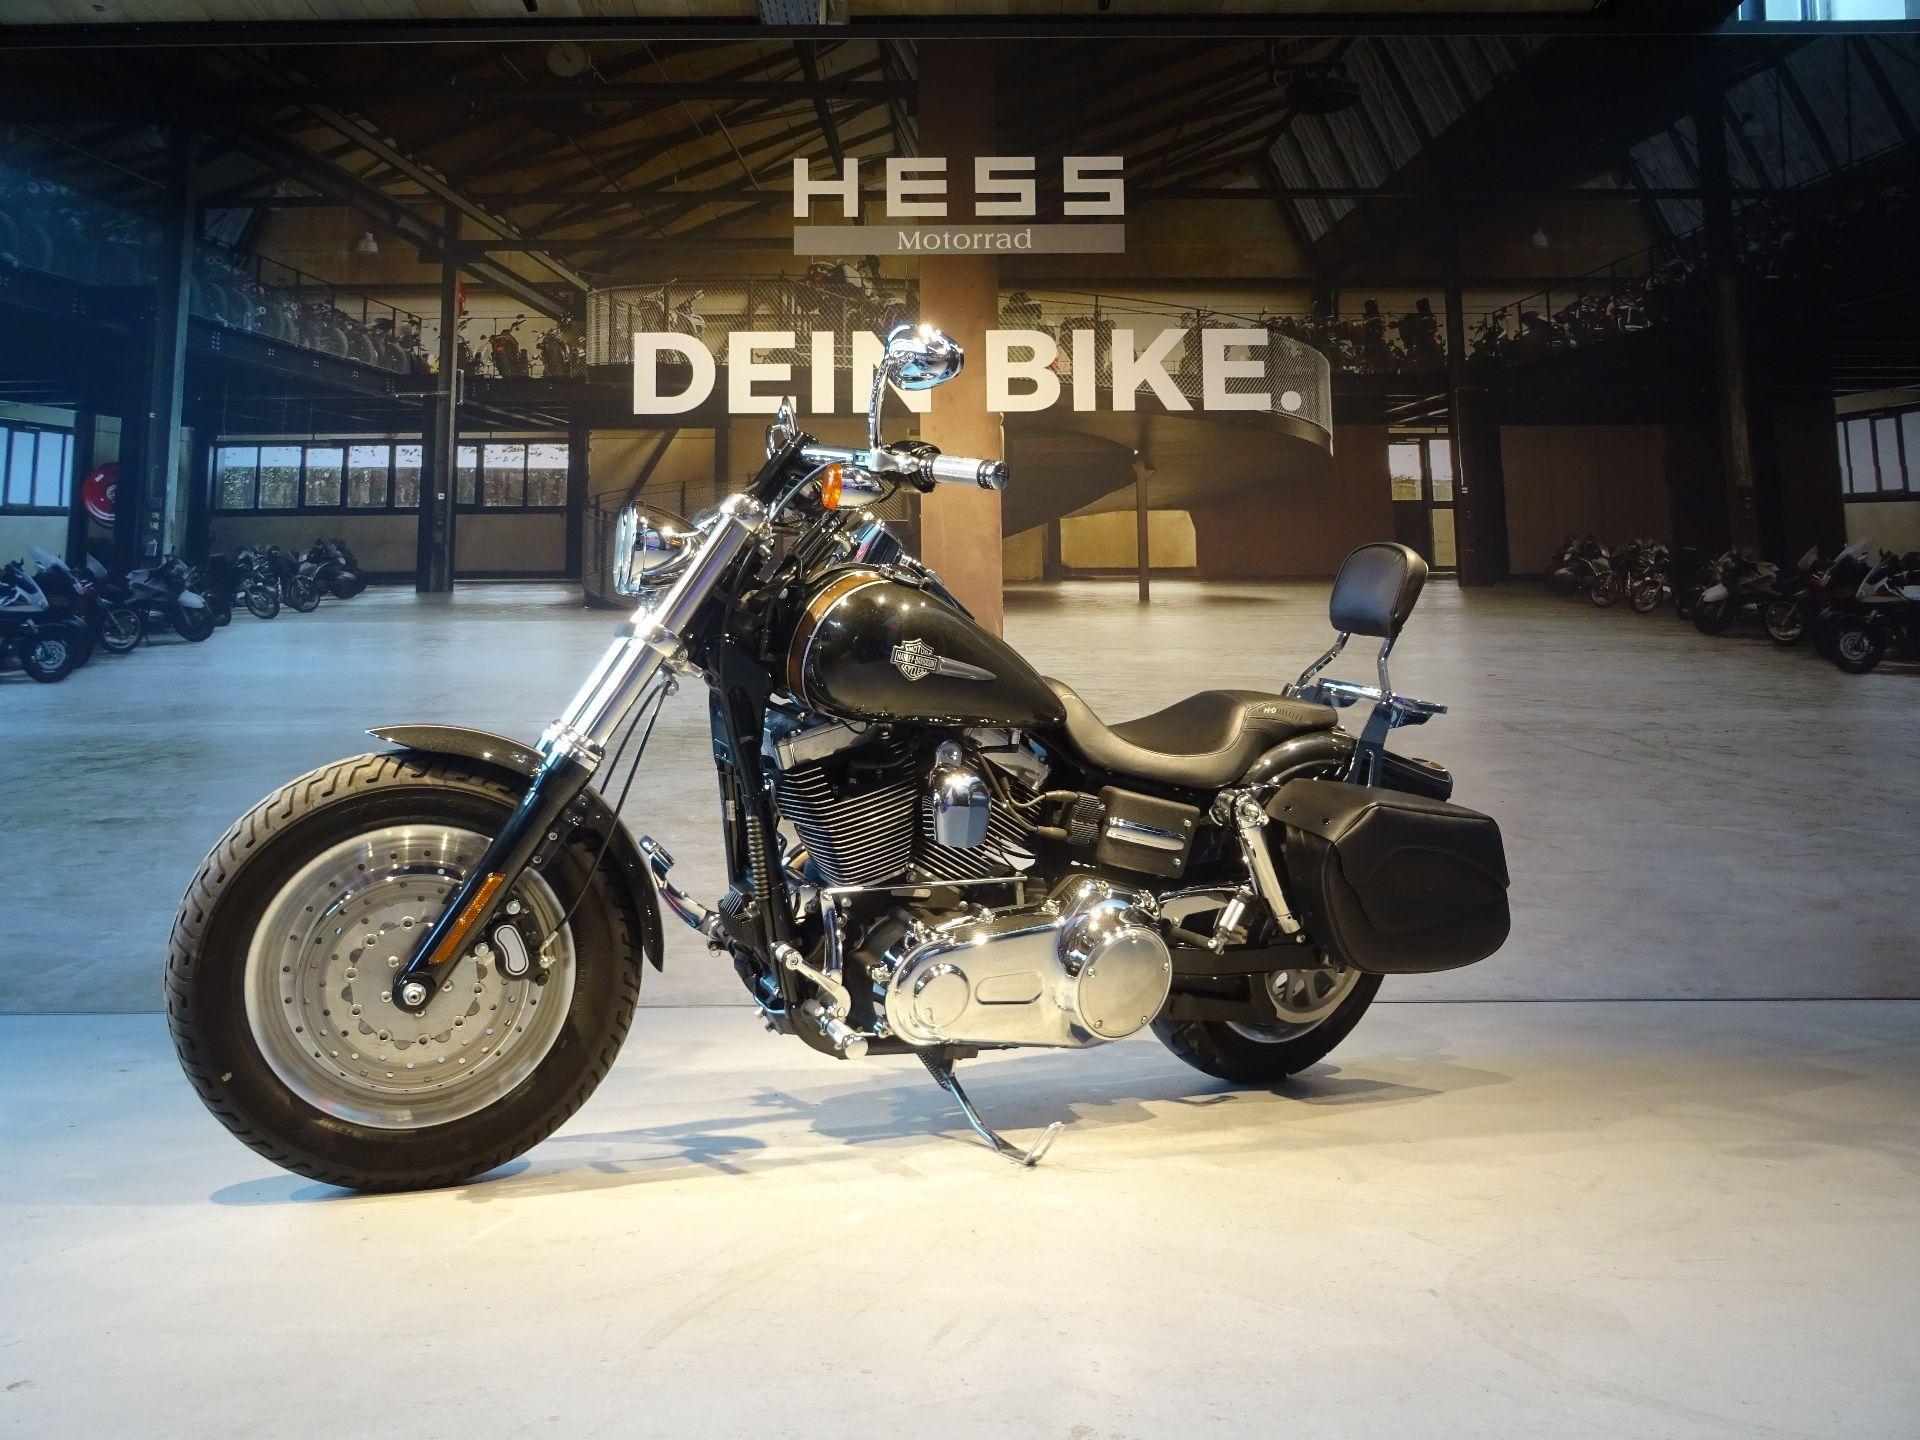 moto occasions acheter harley davidson fxdf 1584 dyna fat bob hess motorrad stettlen. Black Bedroom Furniture Sets. Home Design Ideas